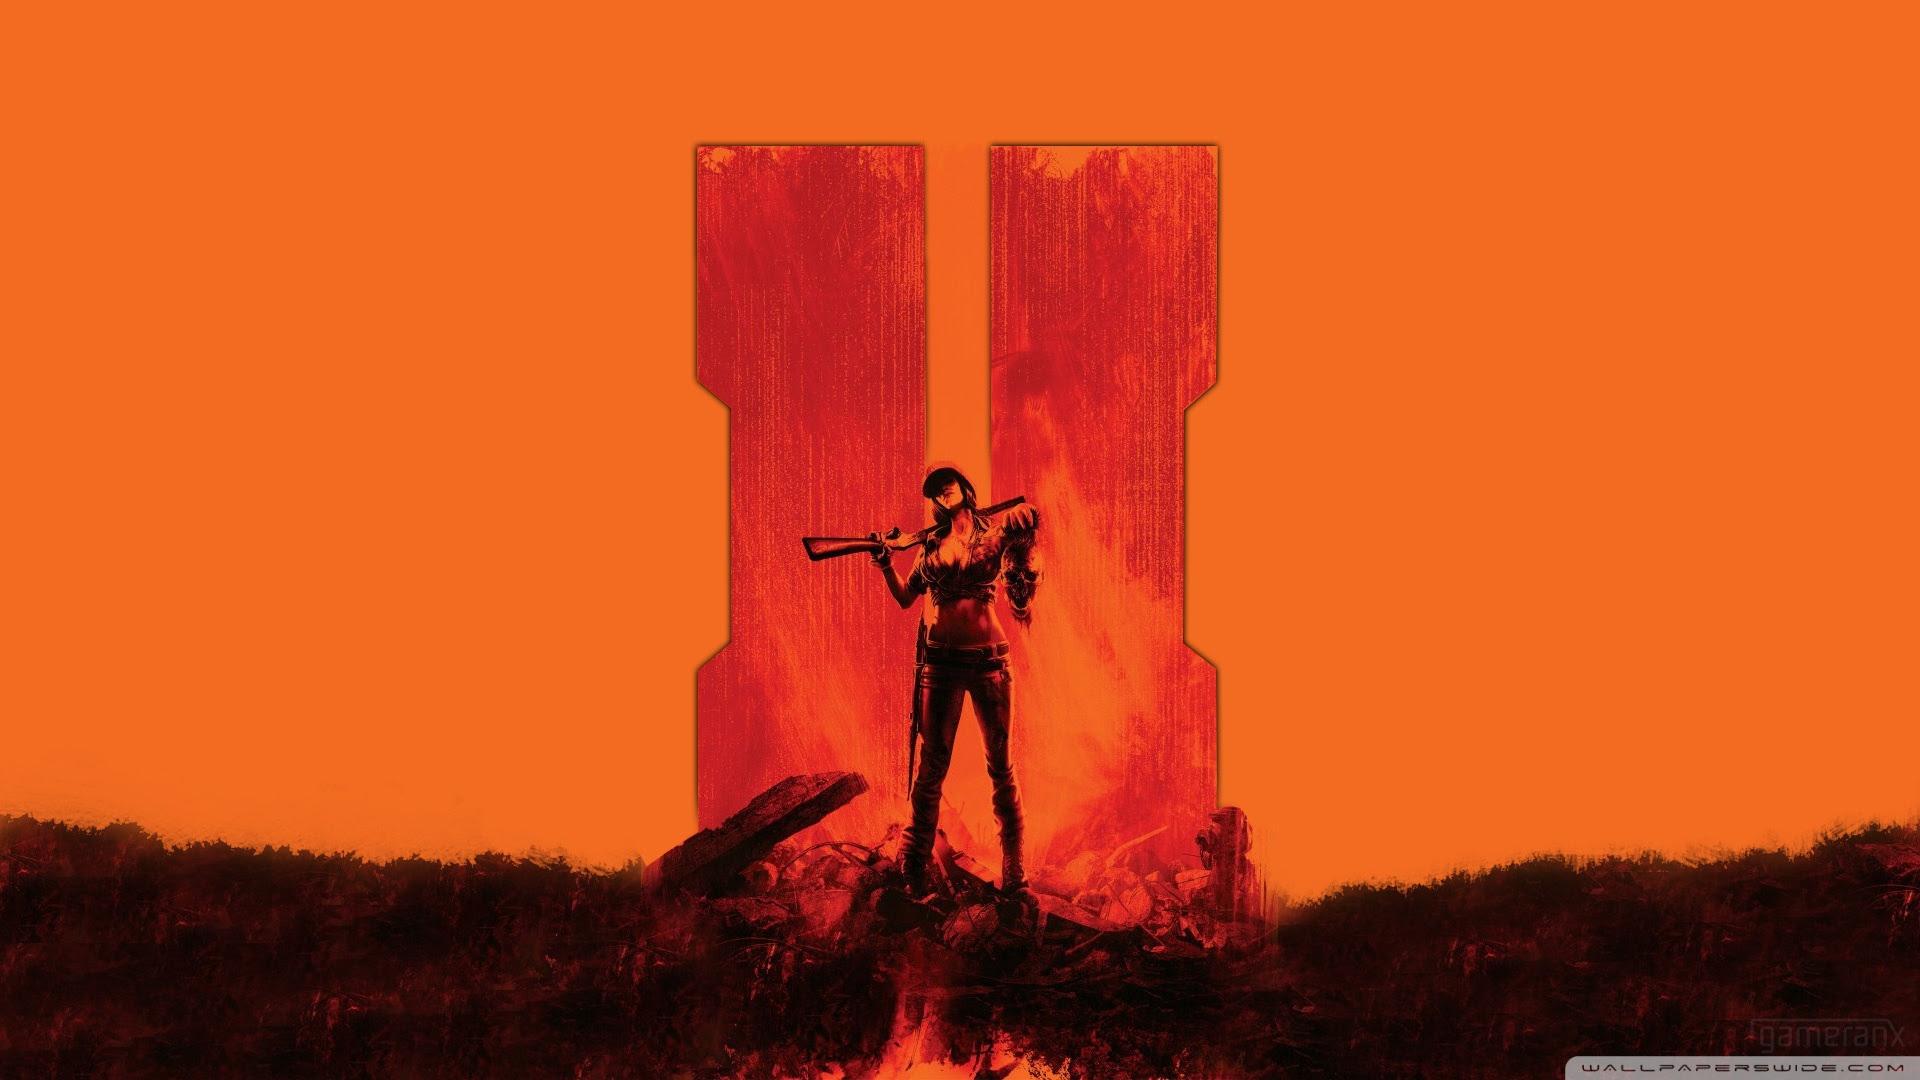 Black Ops 2 Zombies Ultra Hd Desktop Background Wallpaper For 4k